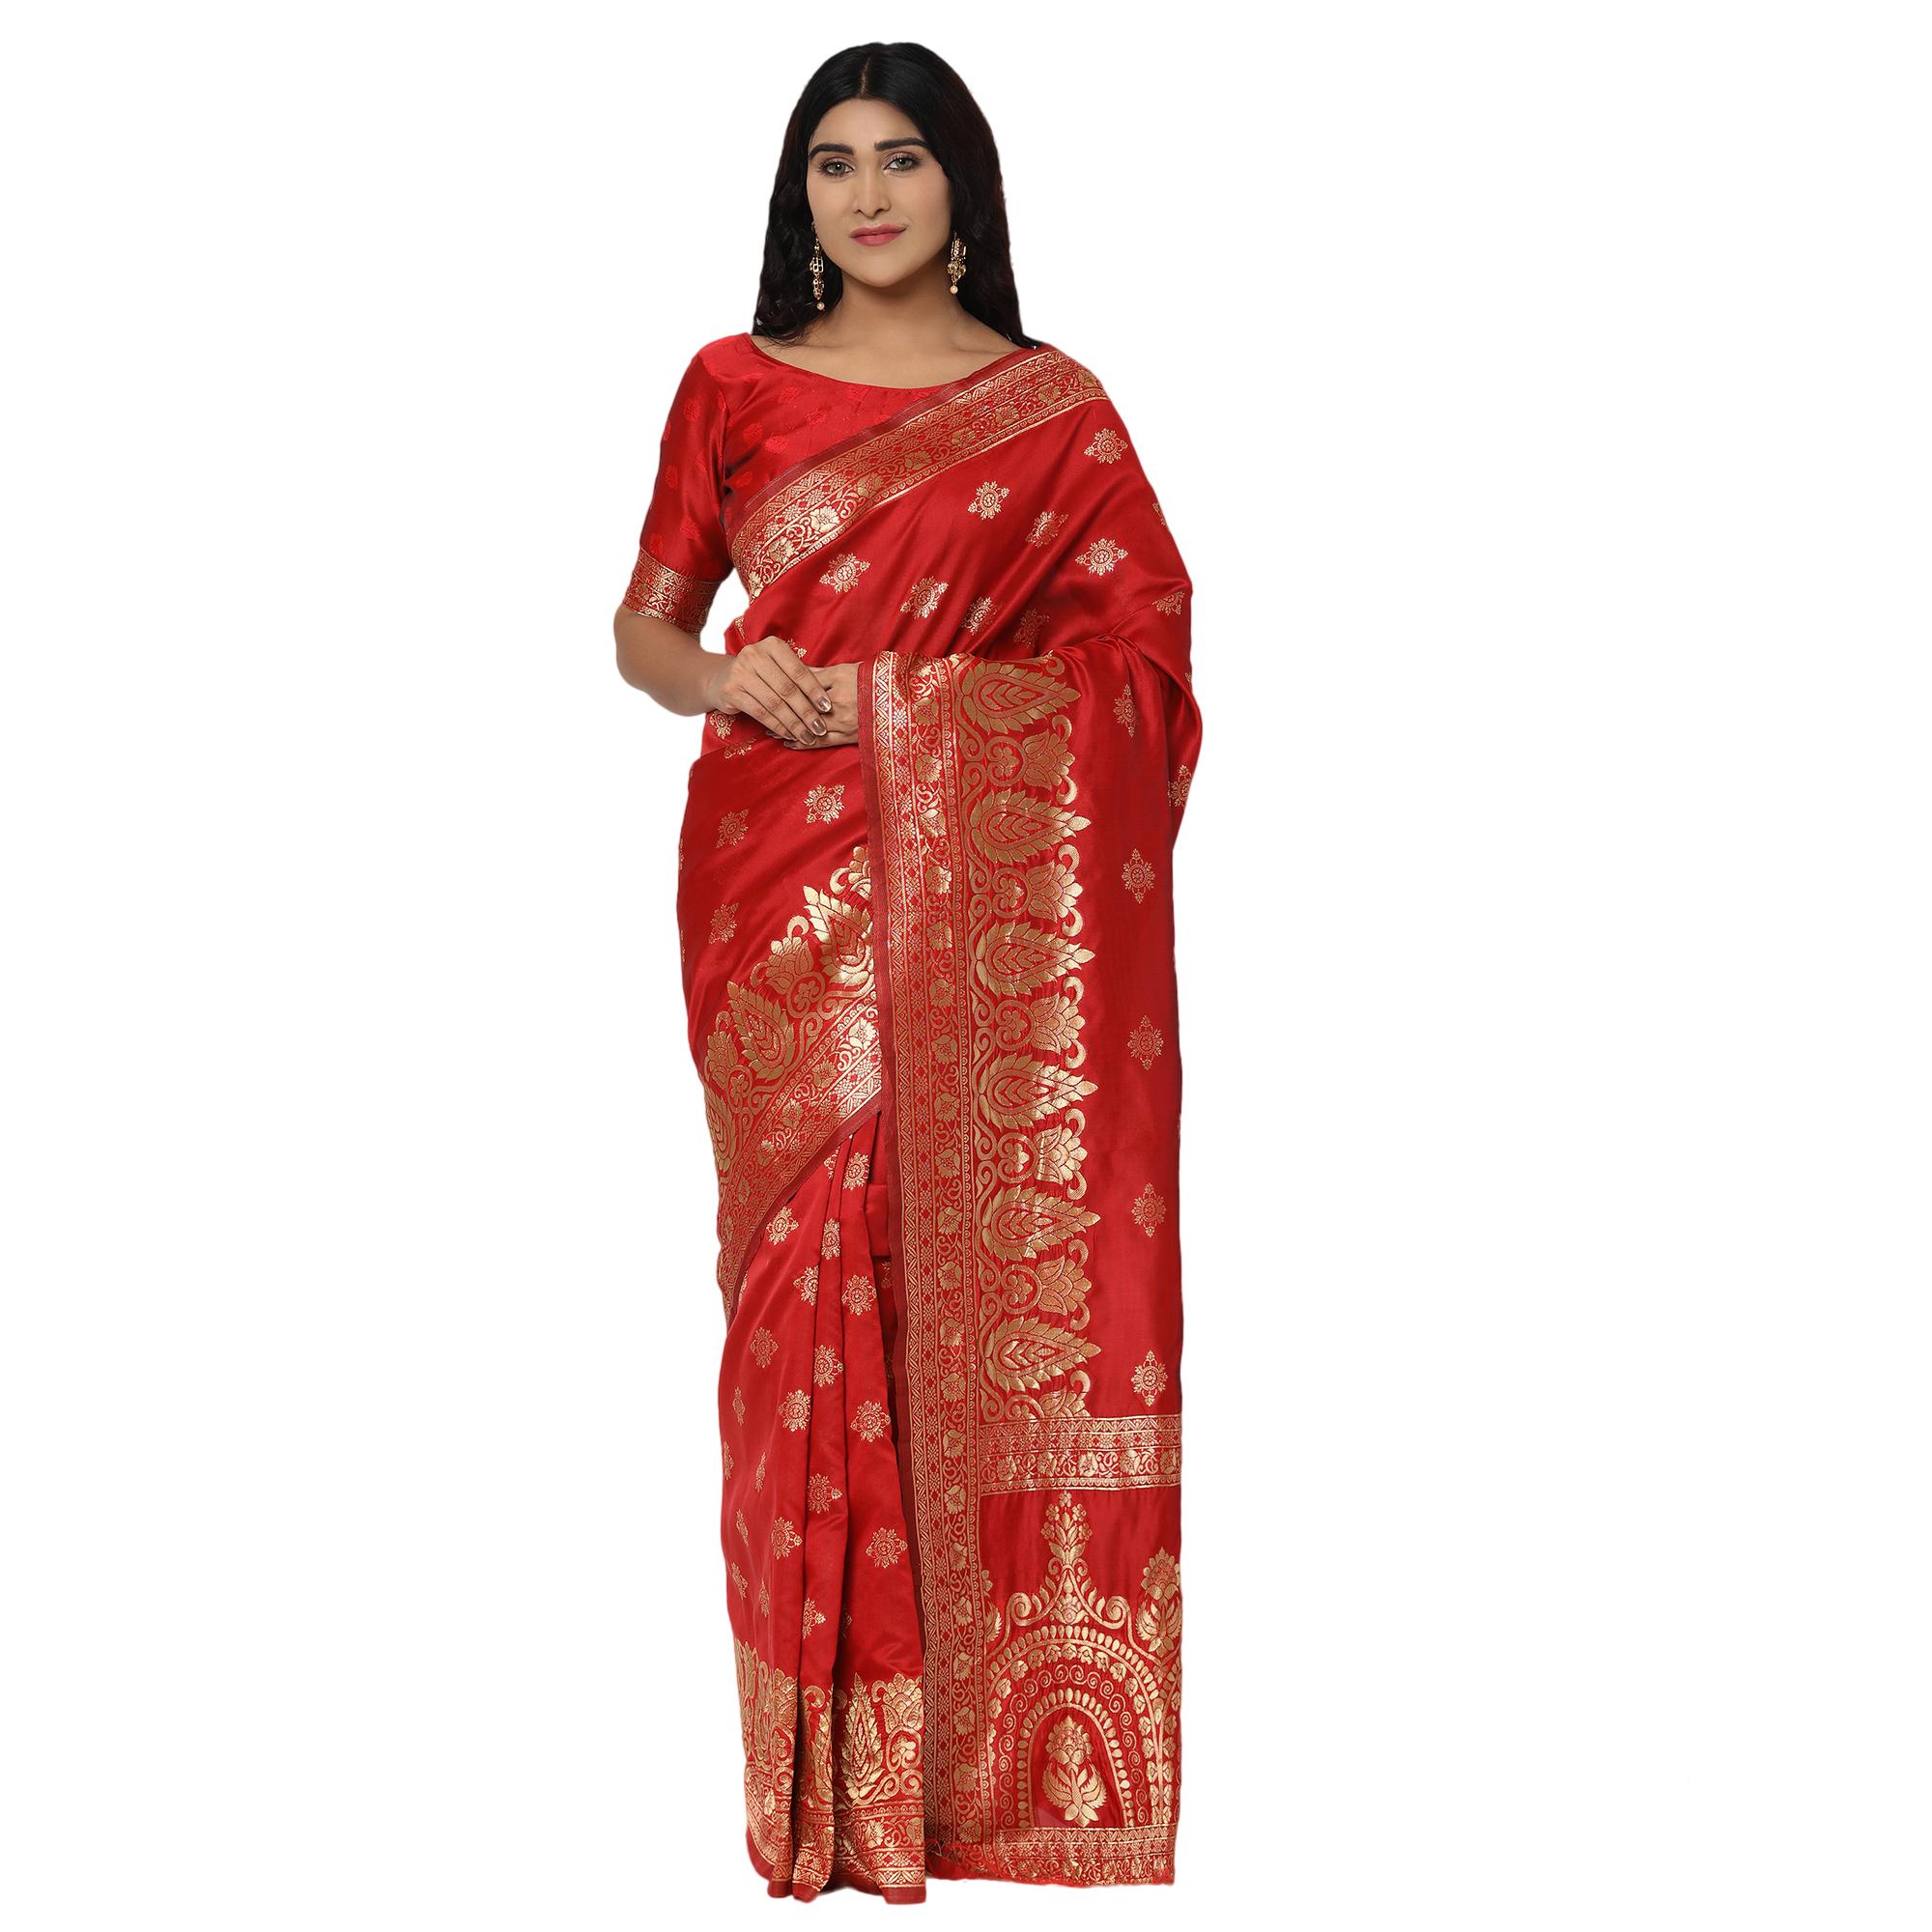 Glemora | Glemora Red Beautiful Ethnic Wear Silk Blend Banarasi Traditional Saree